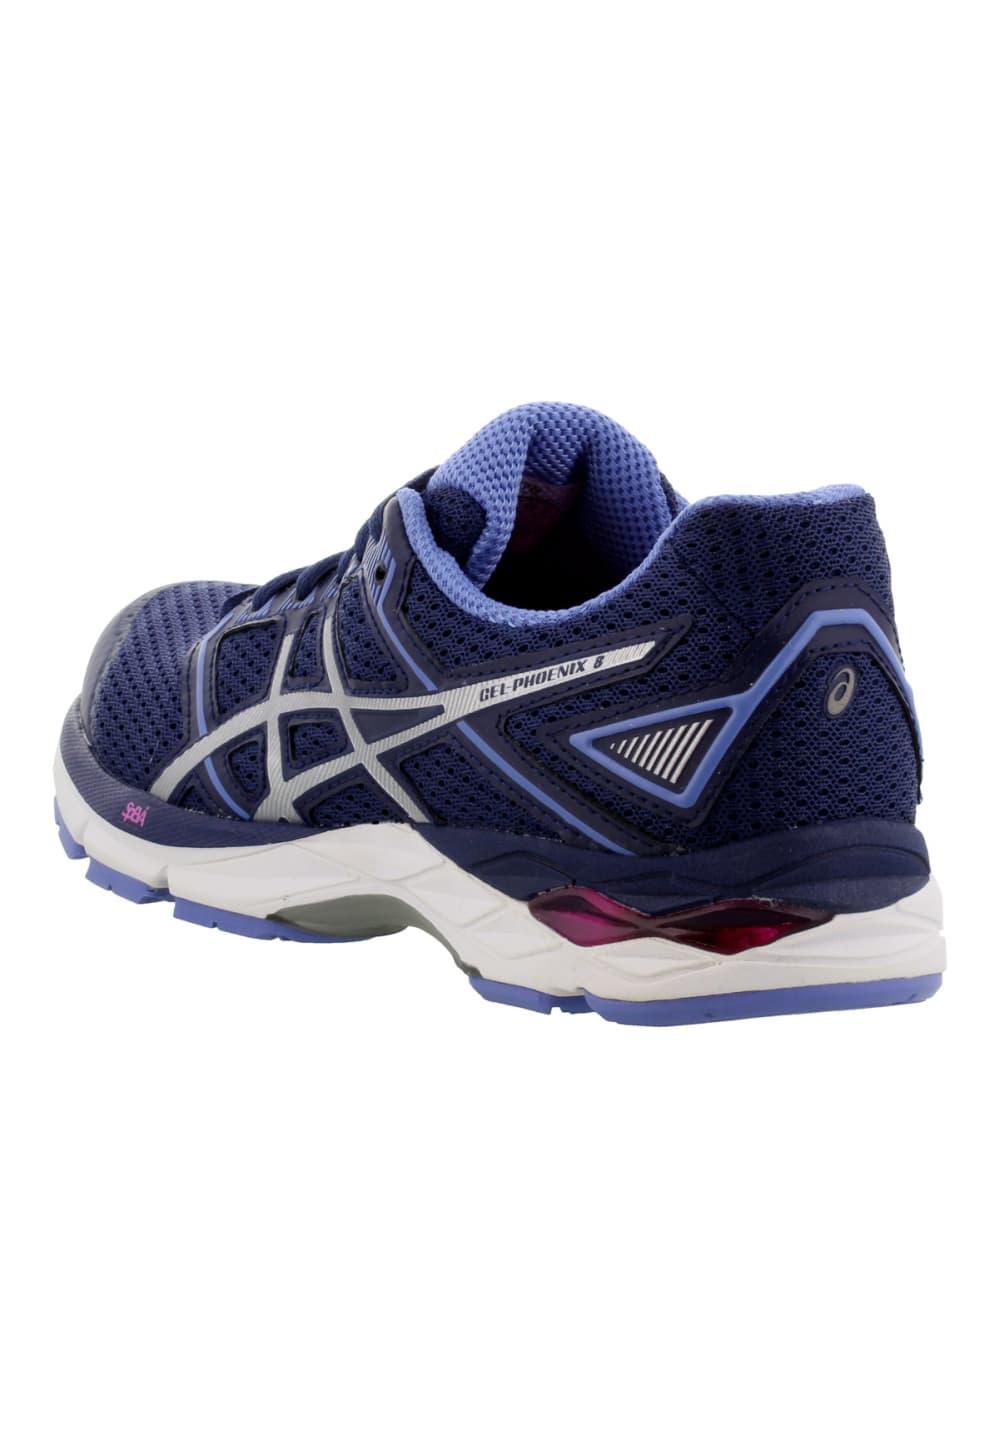 ASICS GEL-Phoenix 8 - Laufschuhe für Damen - Blau